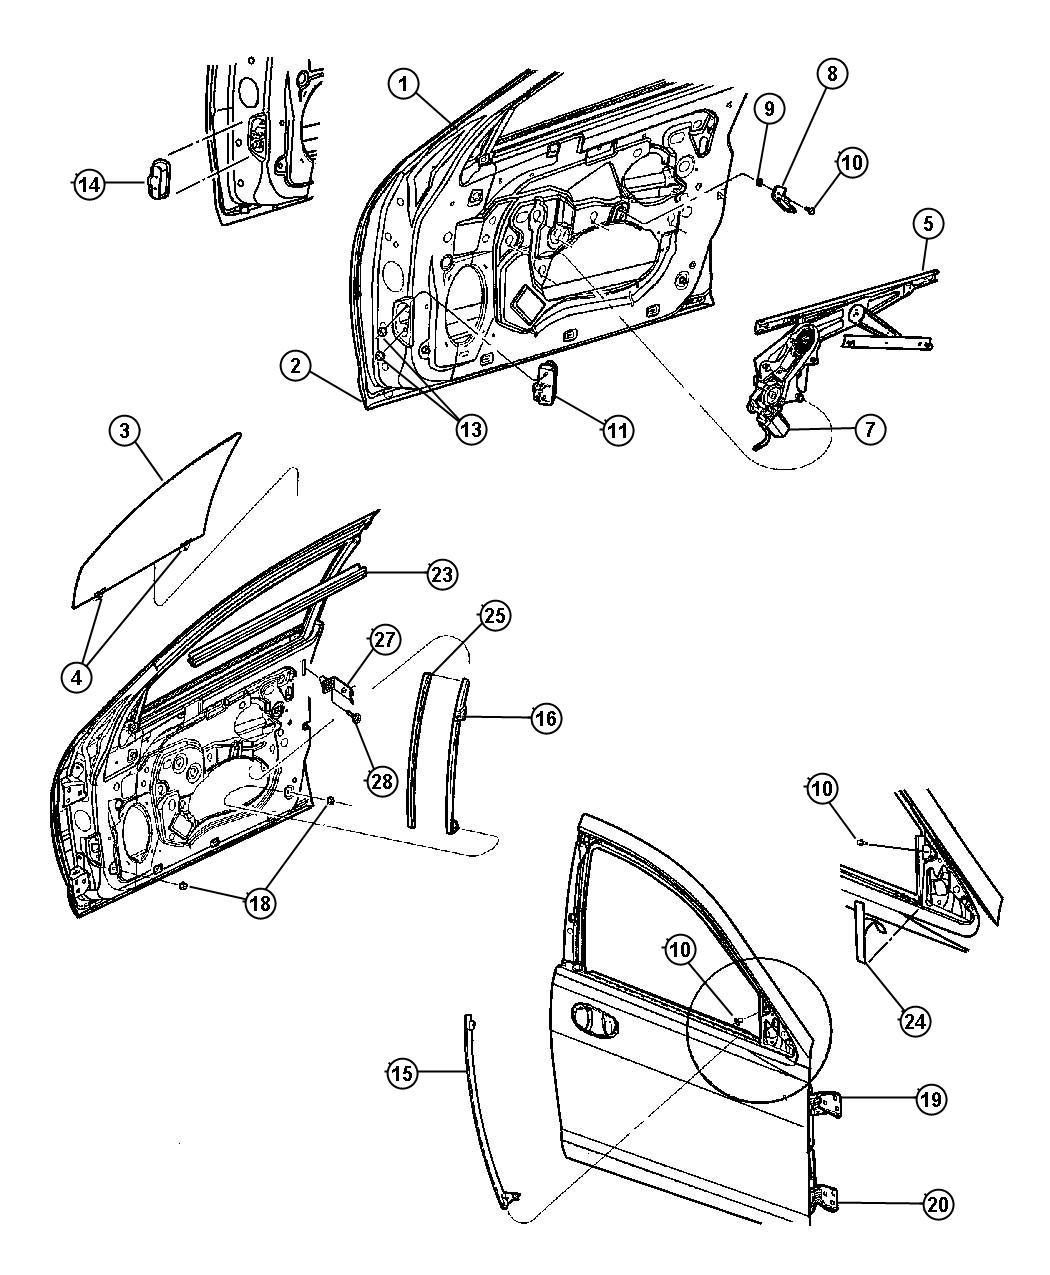 Chrysler Sebring How To Remove Window Handle Crank